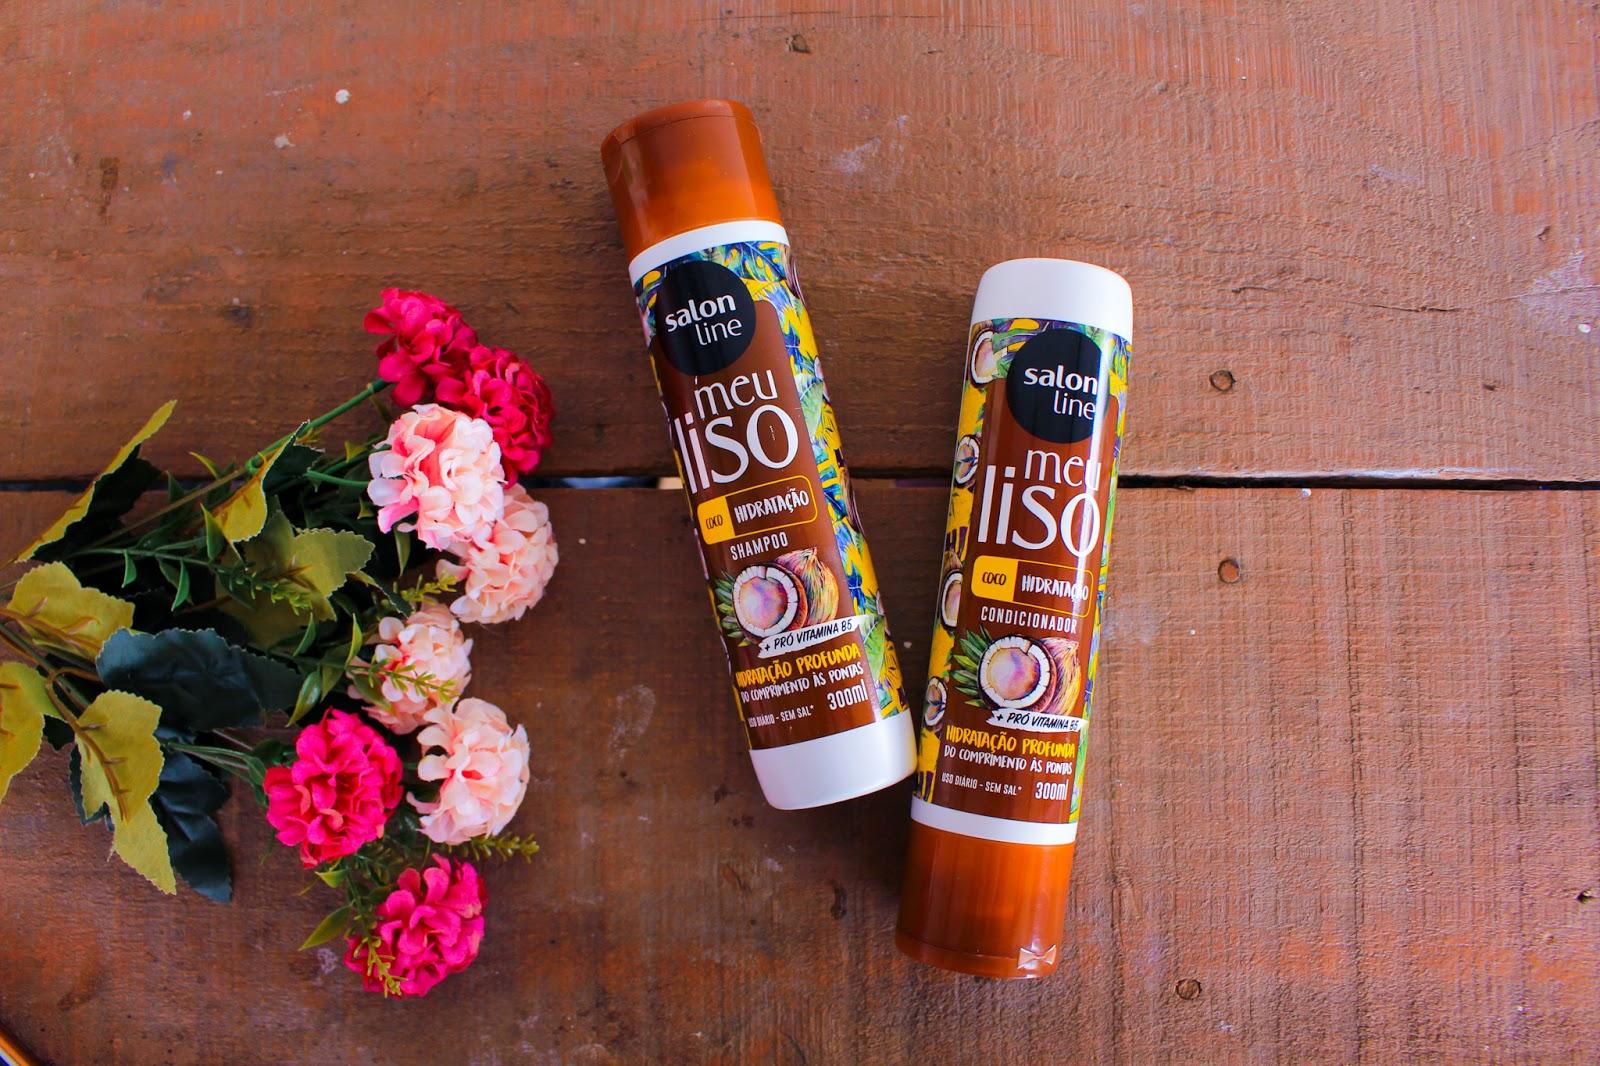 Resenha: Shampoo e Condicionador Meu Liso Coco da Salon Line